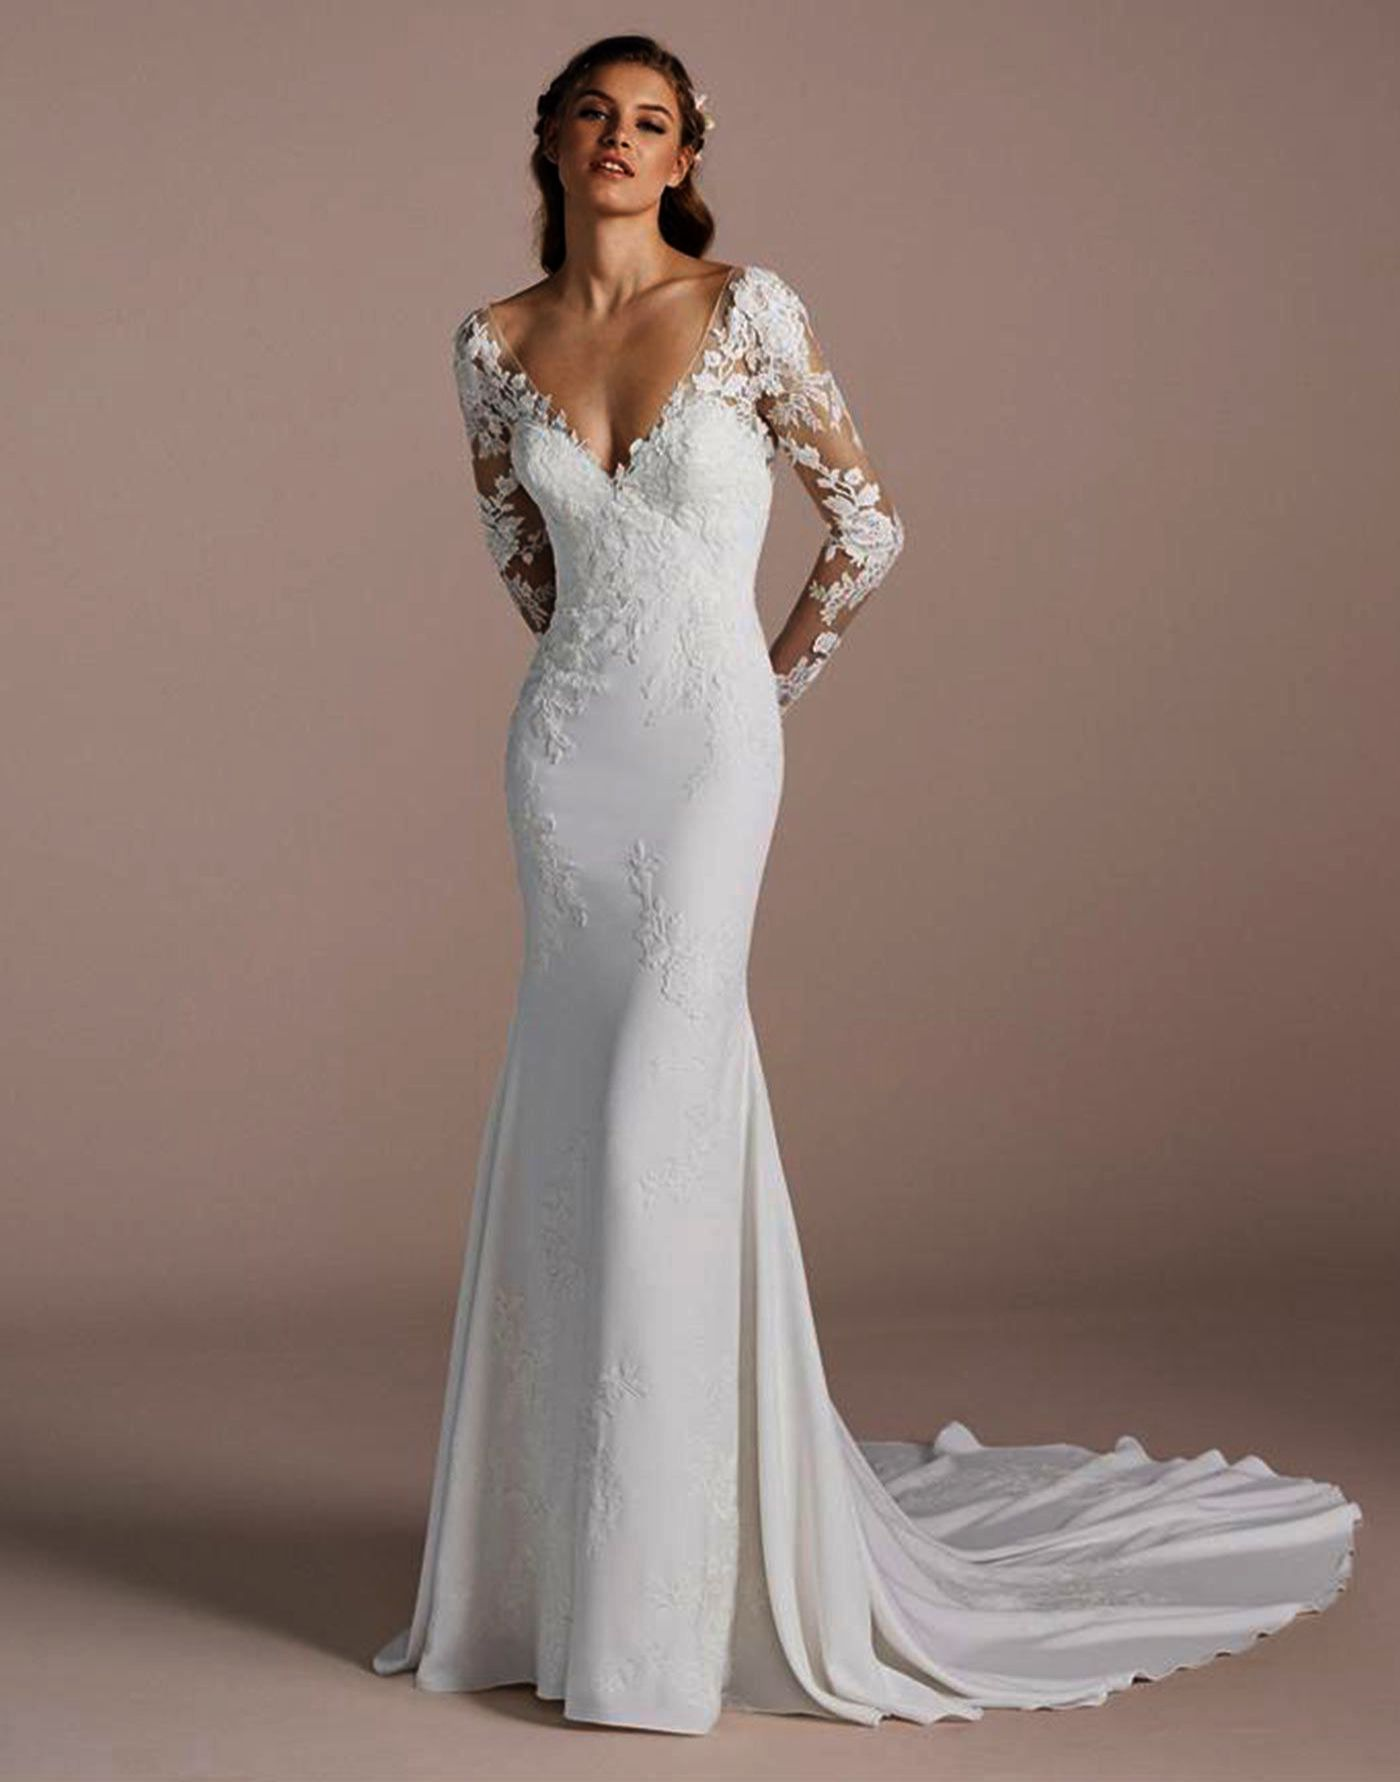 Lace wedding dresses cape town near lace princess wedding